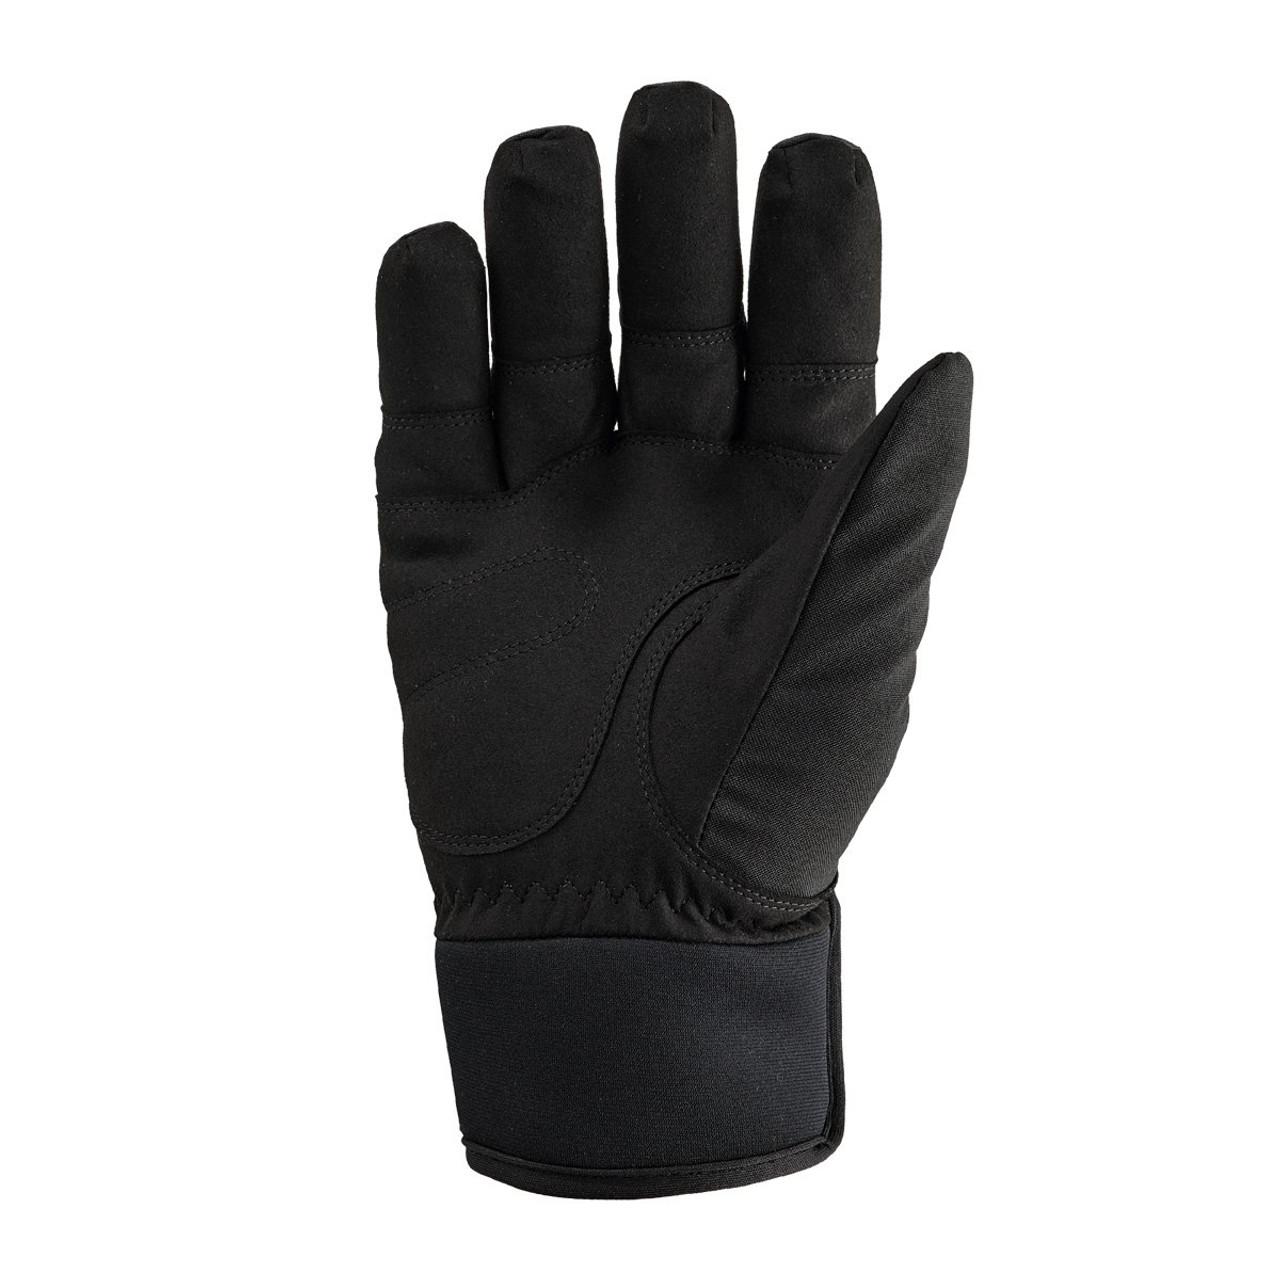 Striker Ice 2021 Attack Ice Fishing Gloves